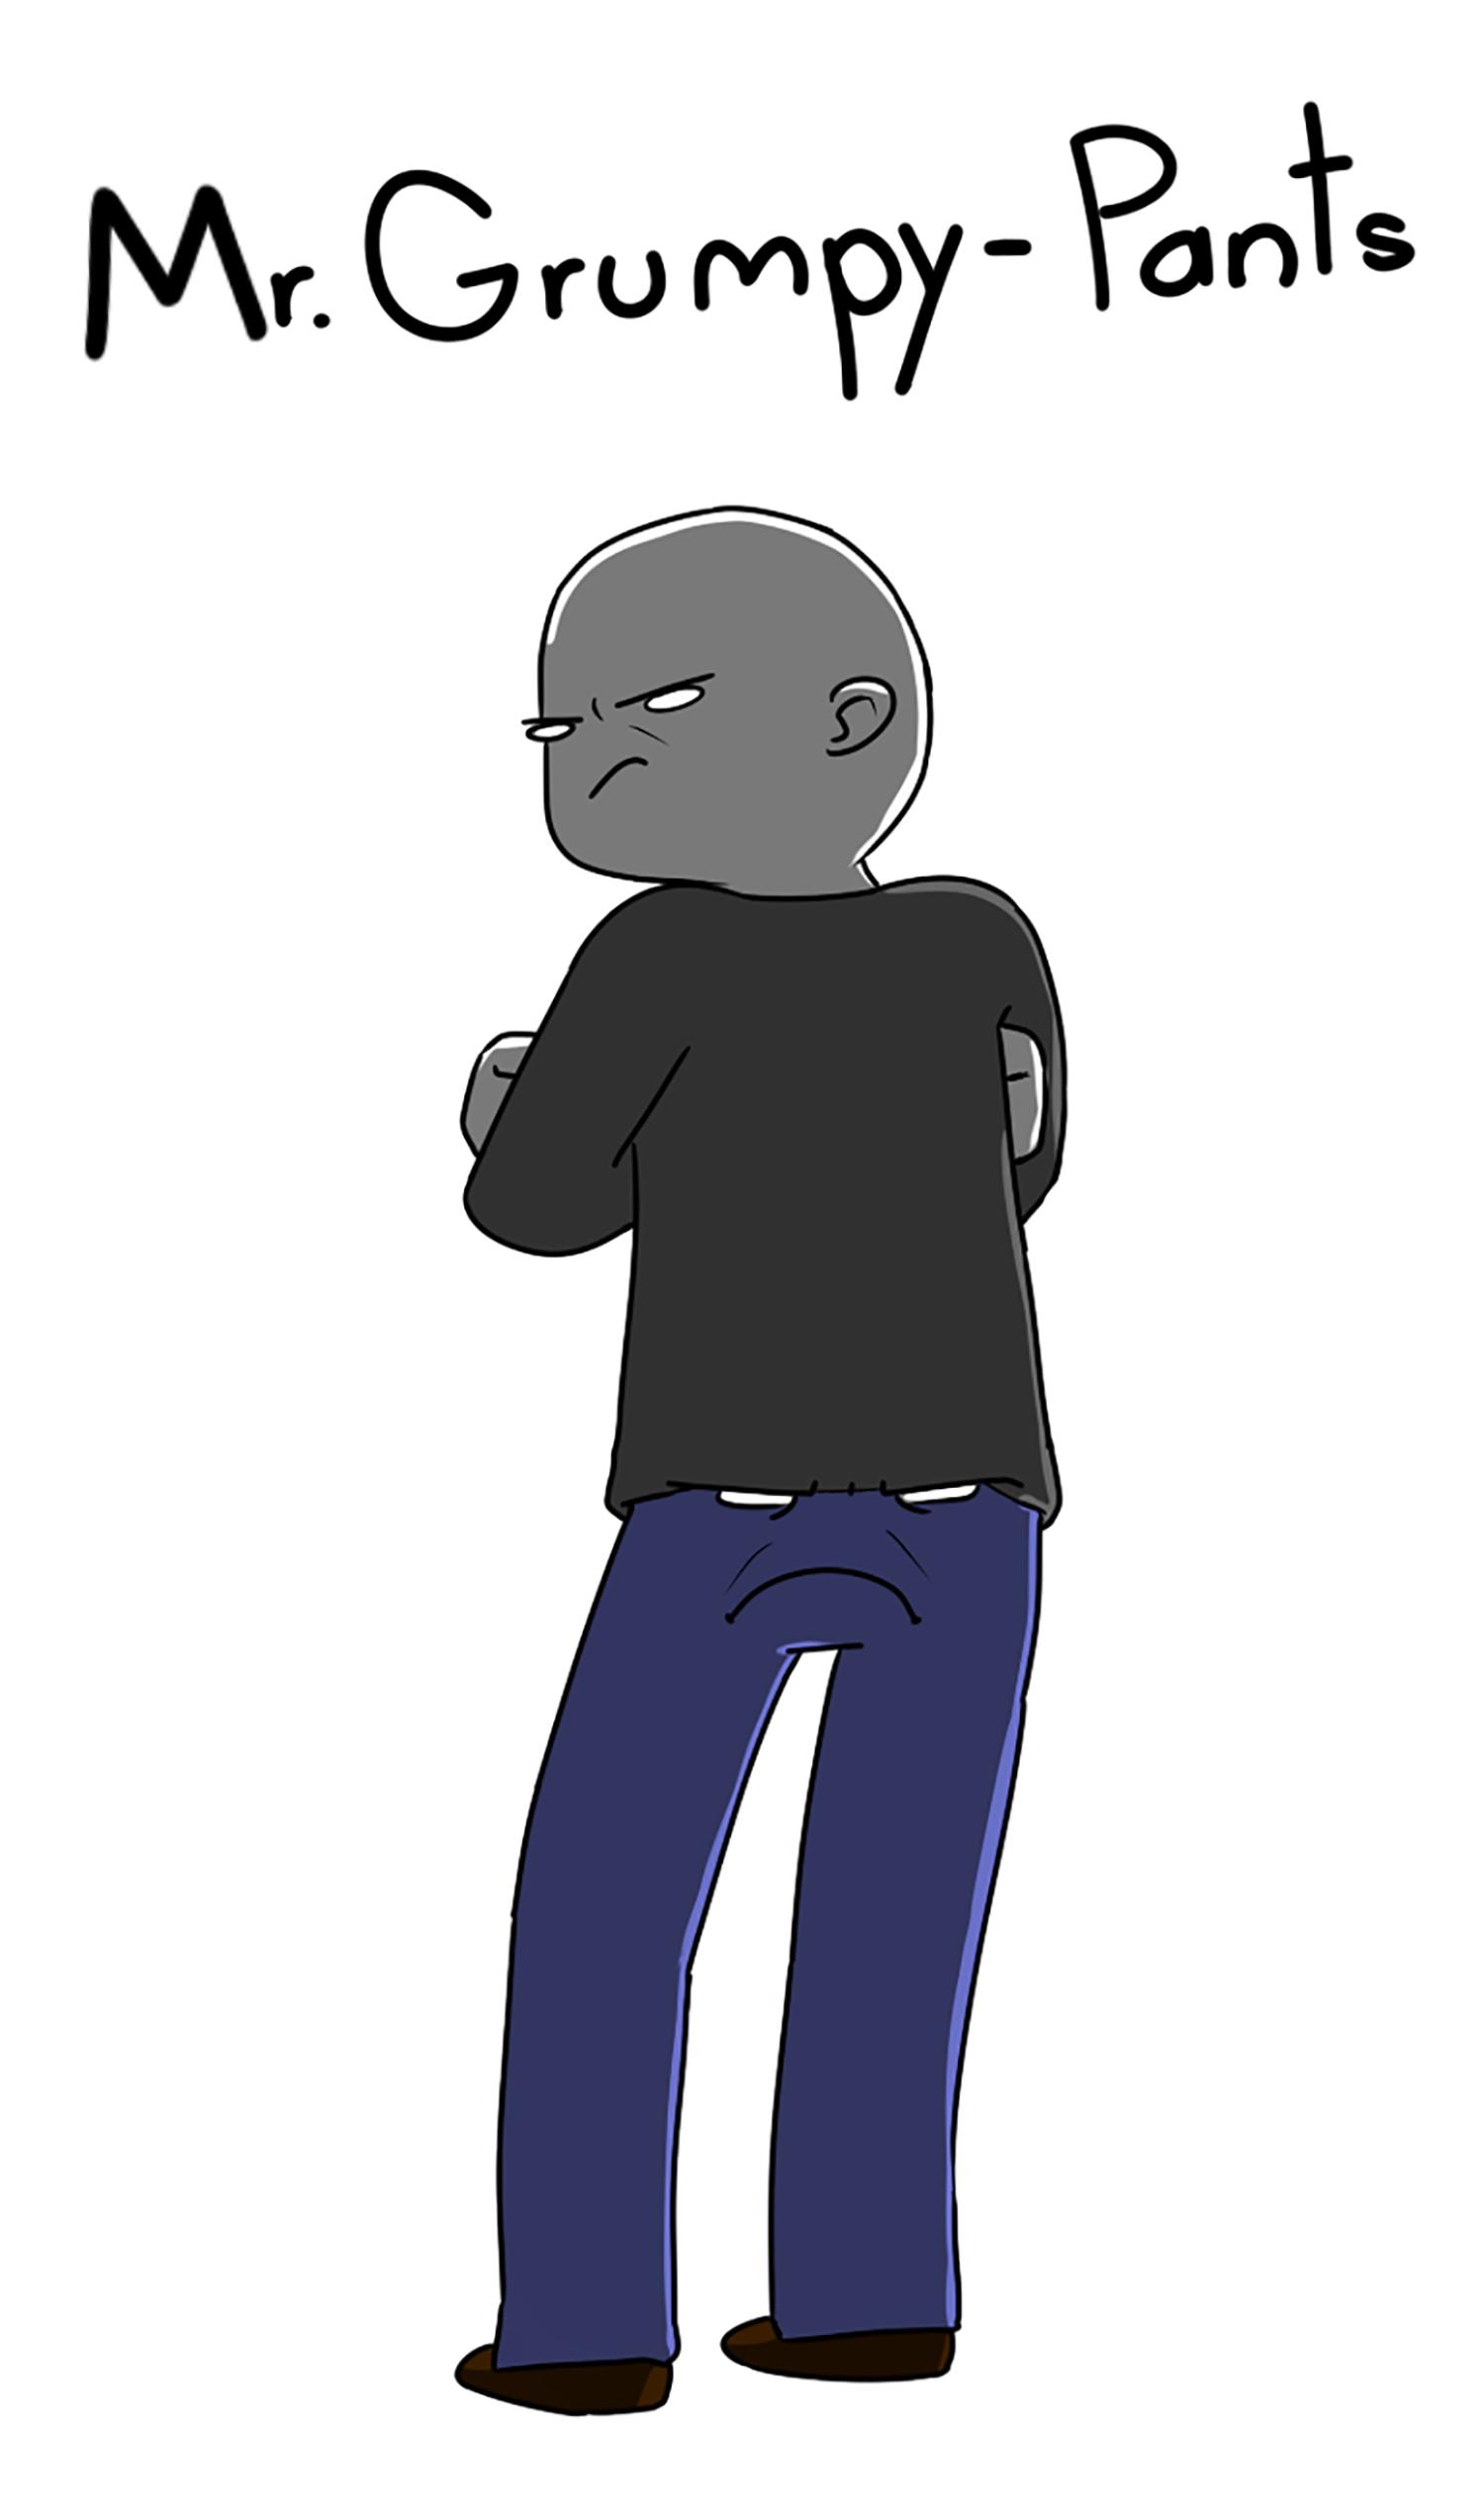 Mr. Grumpy-Pants